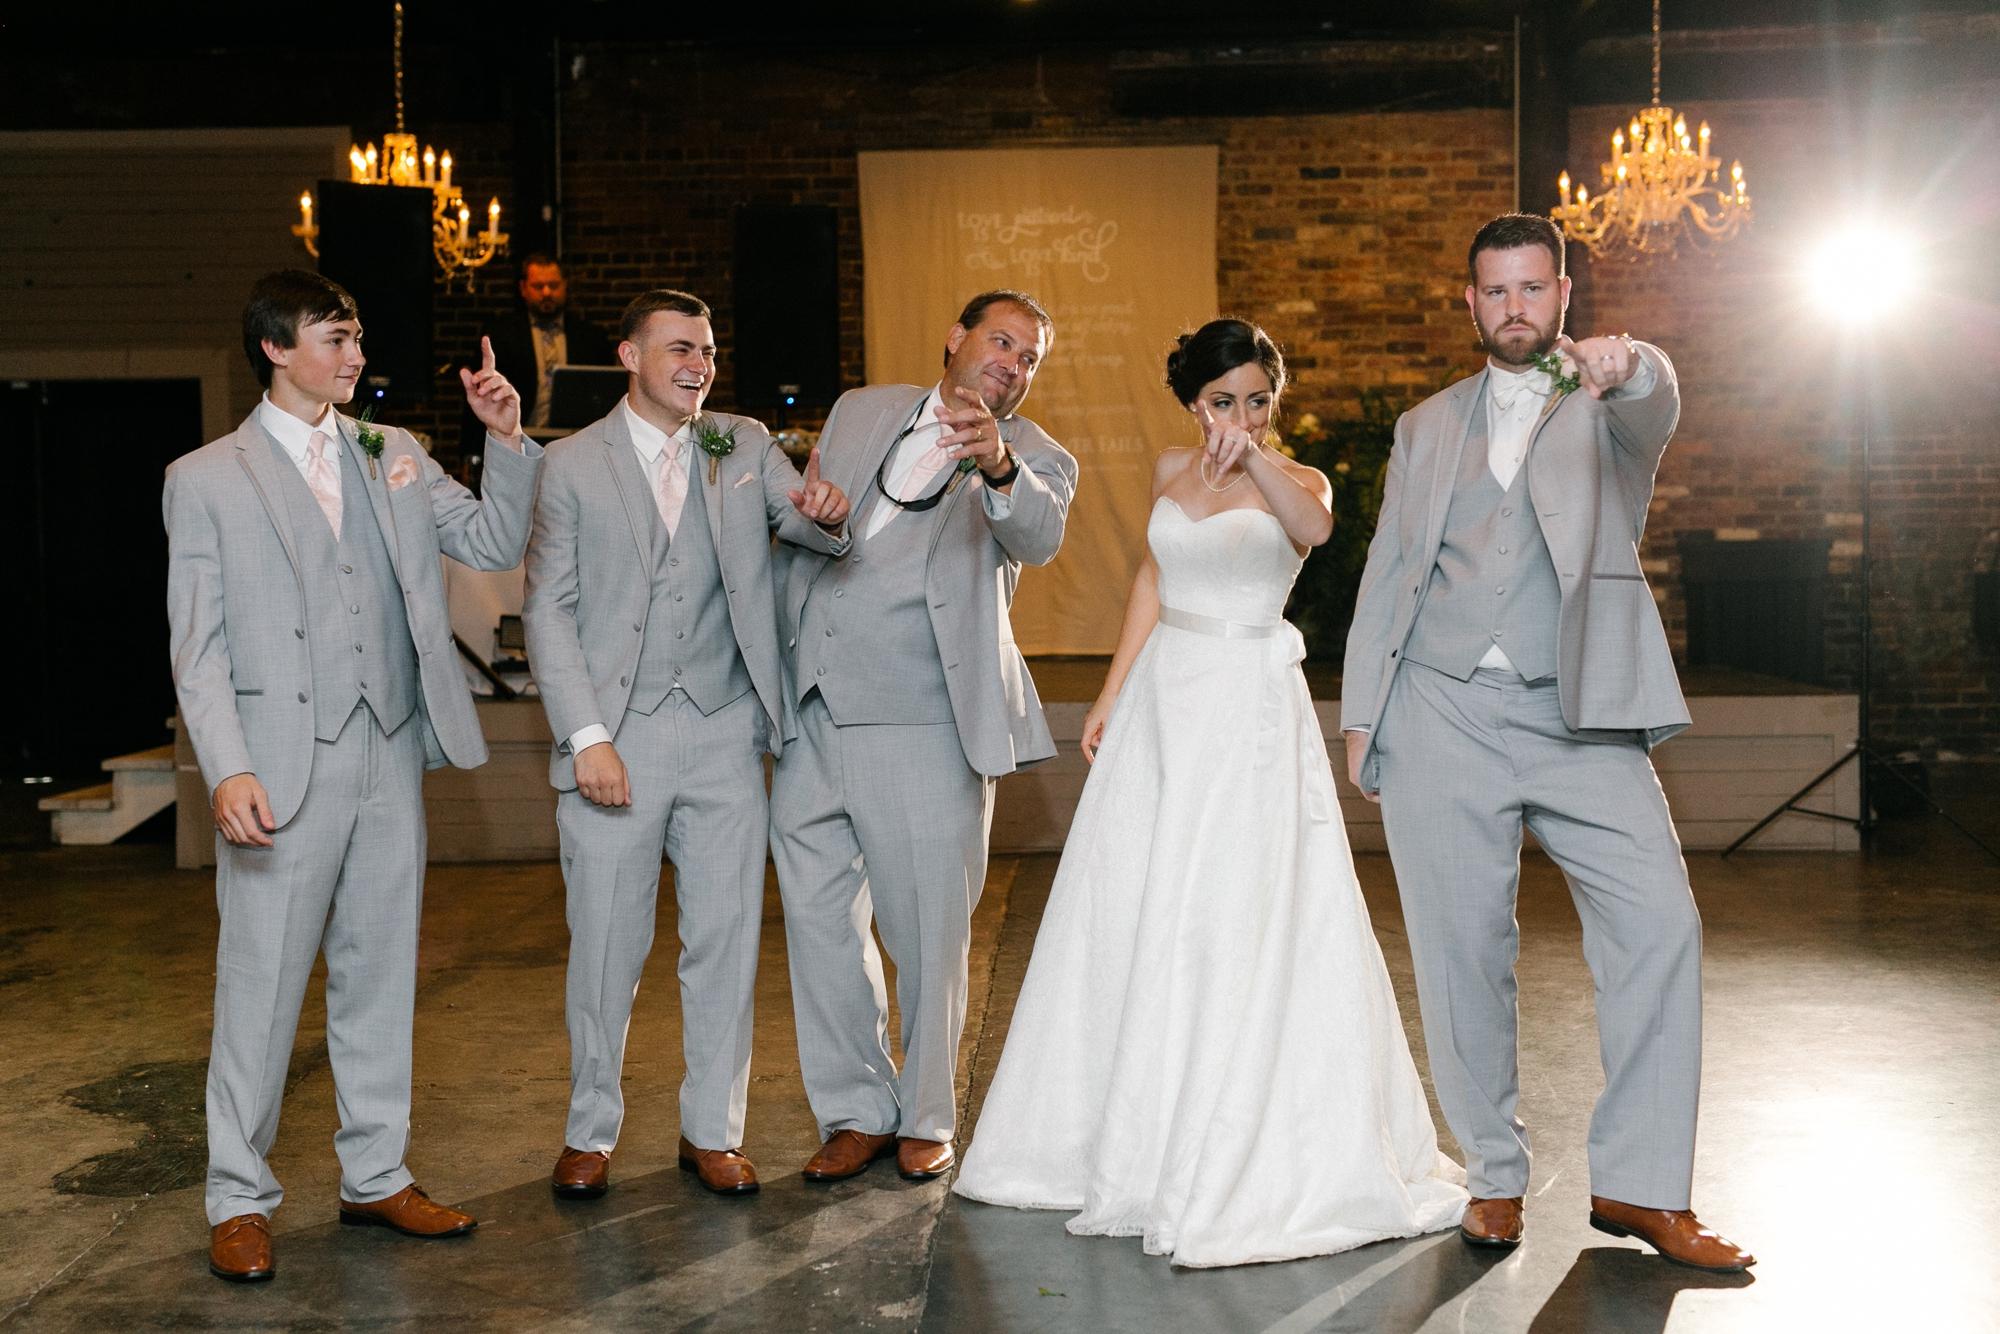 New_Orleans_Wedding_Photographer_1301.jpg